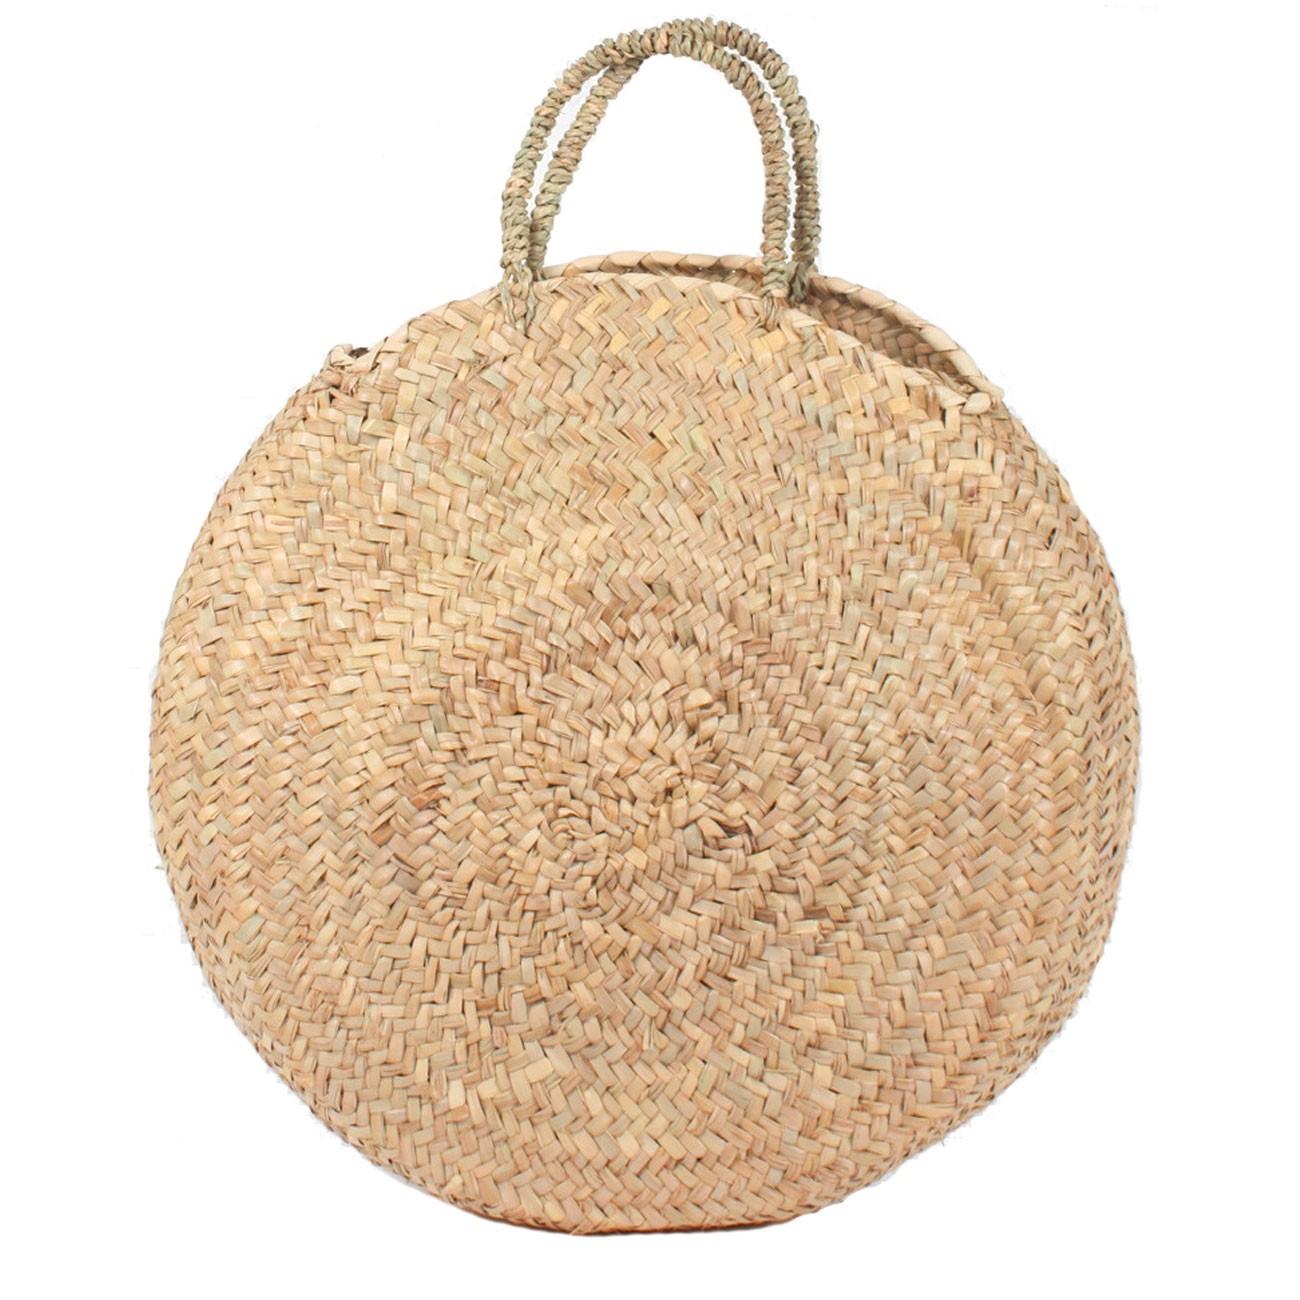 Round large wicker basket natural Handles